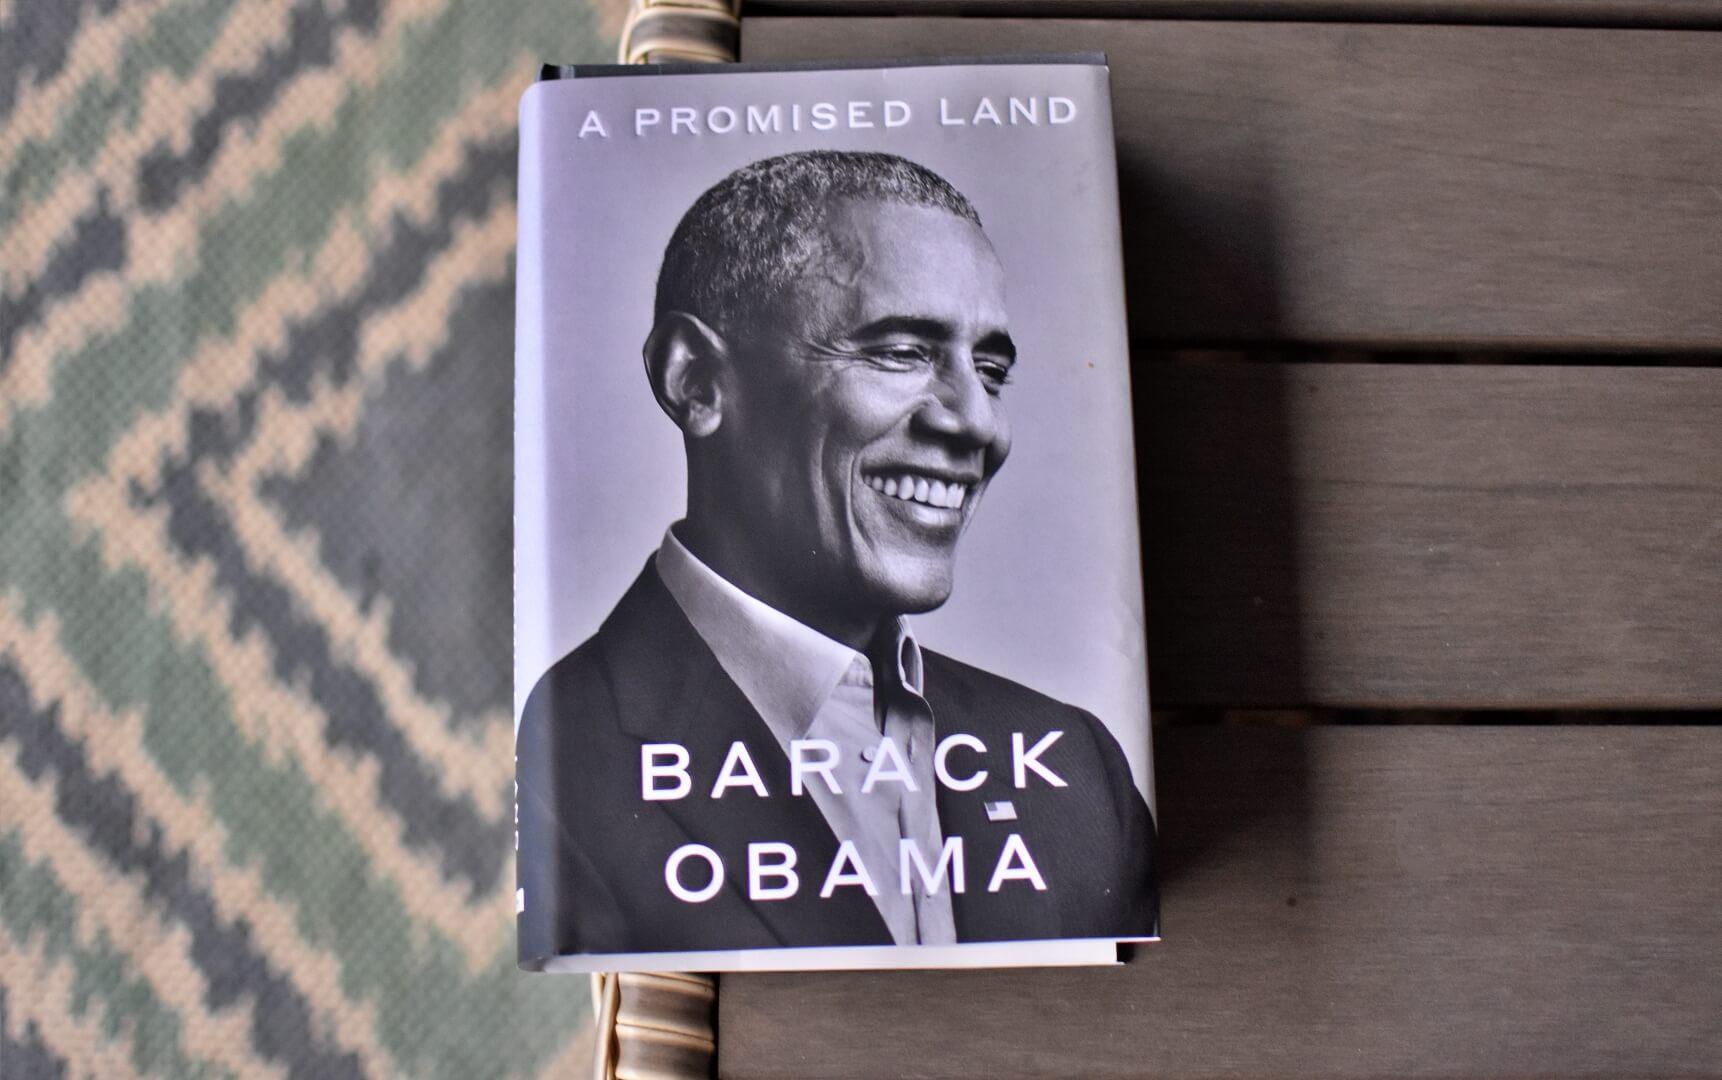 معرفی کتاب «سرزمین موعود» نوشته باراک اوباما ( A Promised Land )